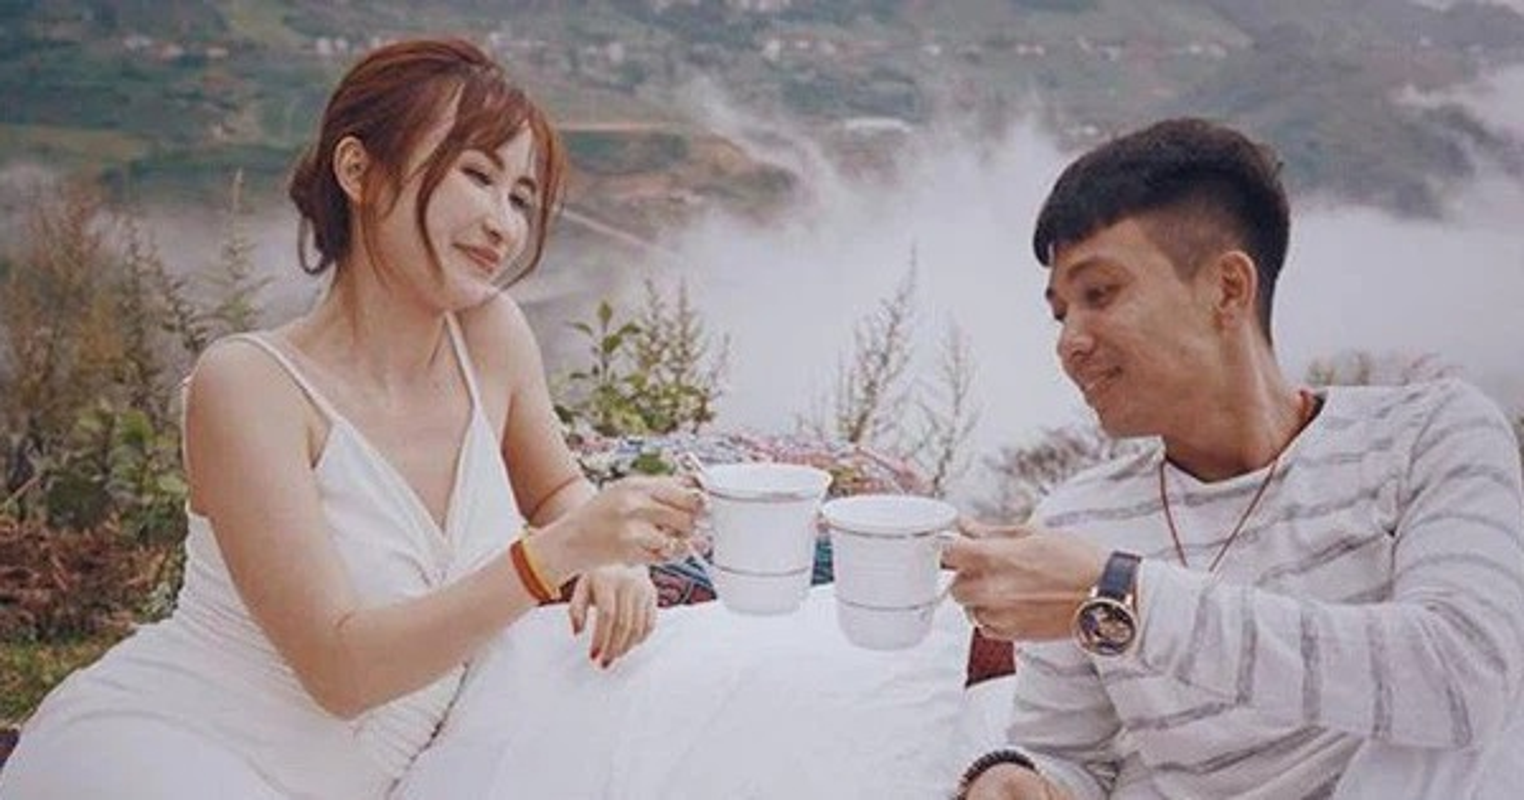 Gian cach o nha, Minh Nhua tu tin lam dieu nay cho vo hai-Hinh-10